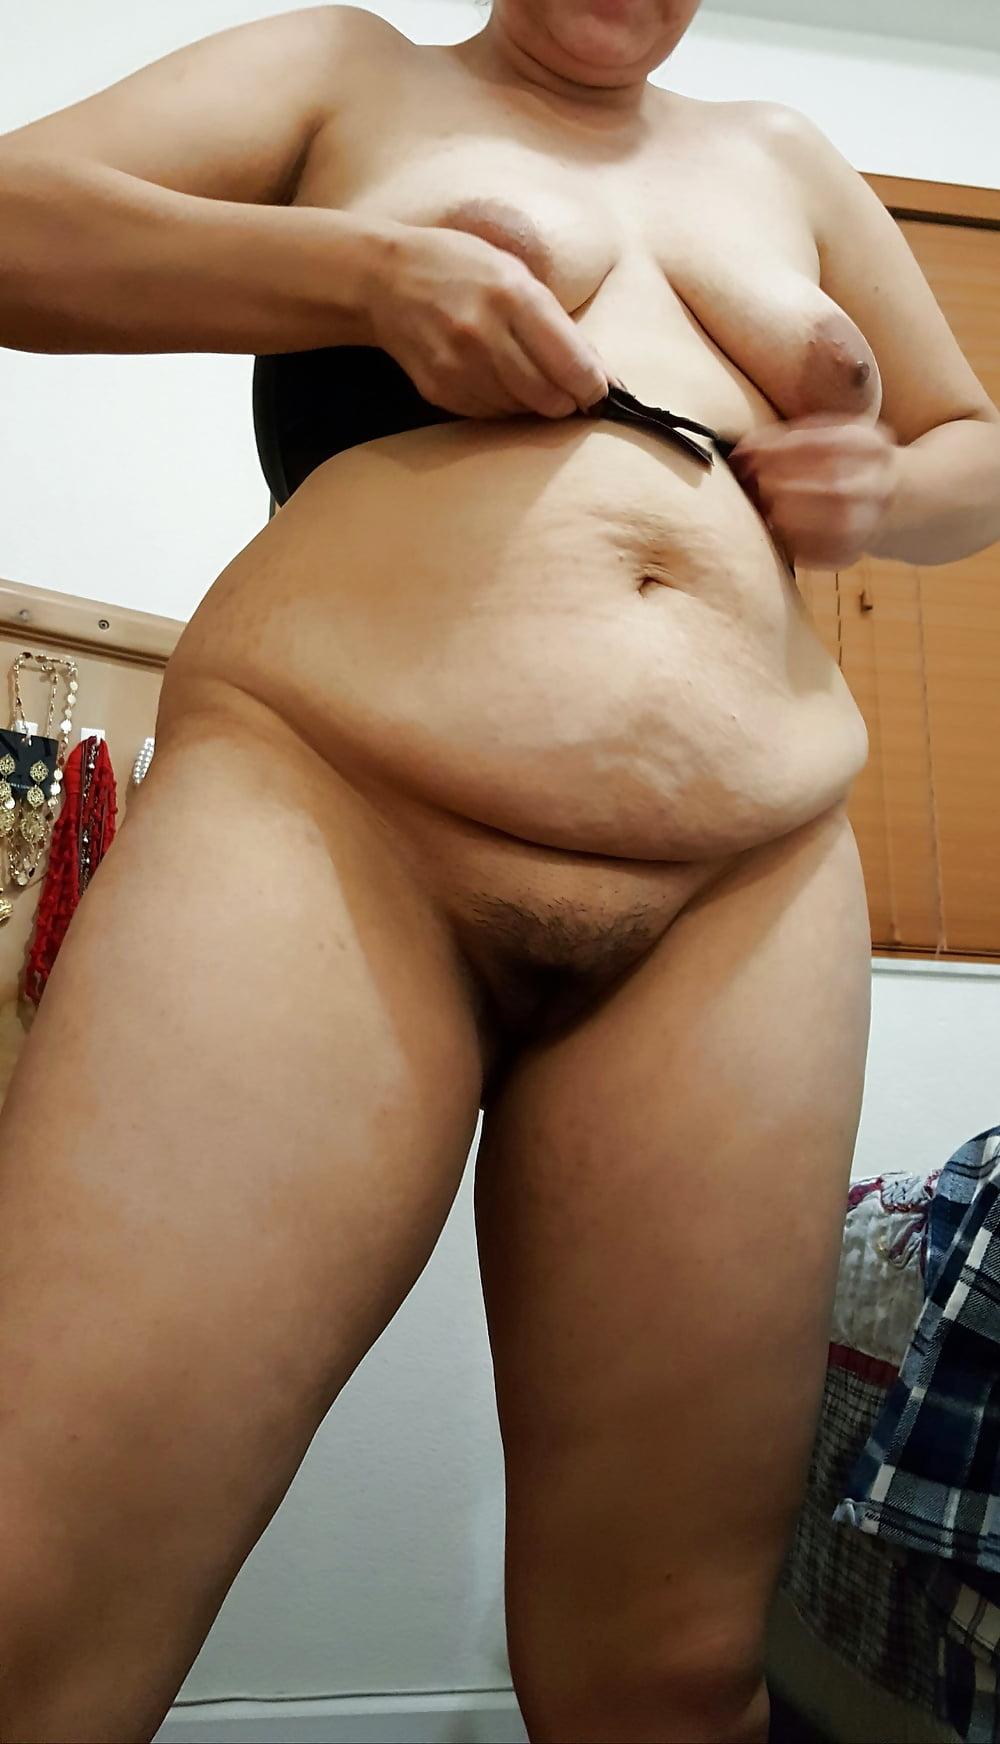 Pussyhair